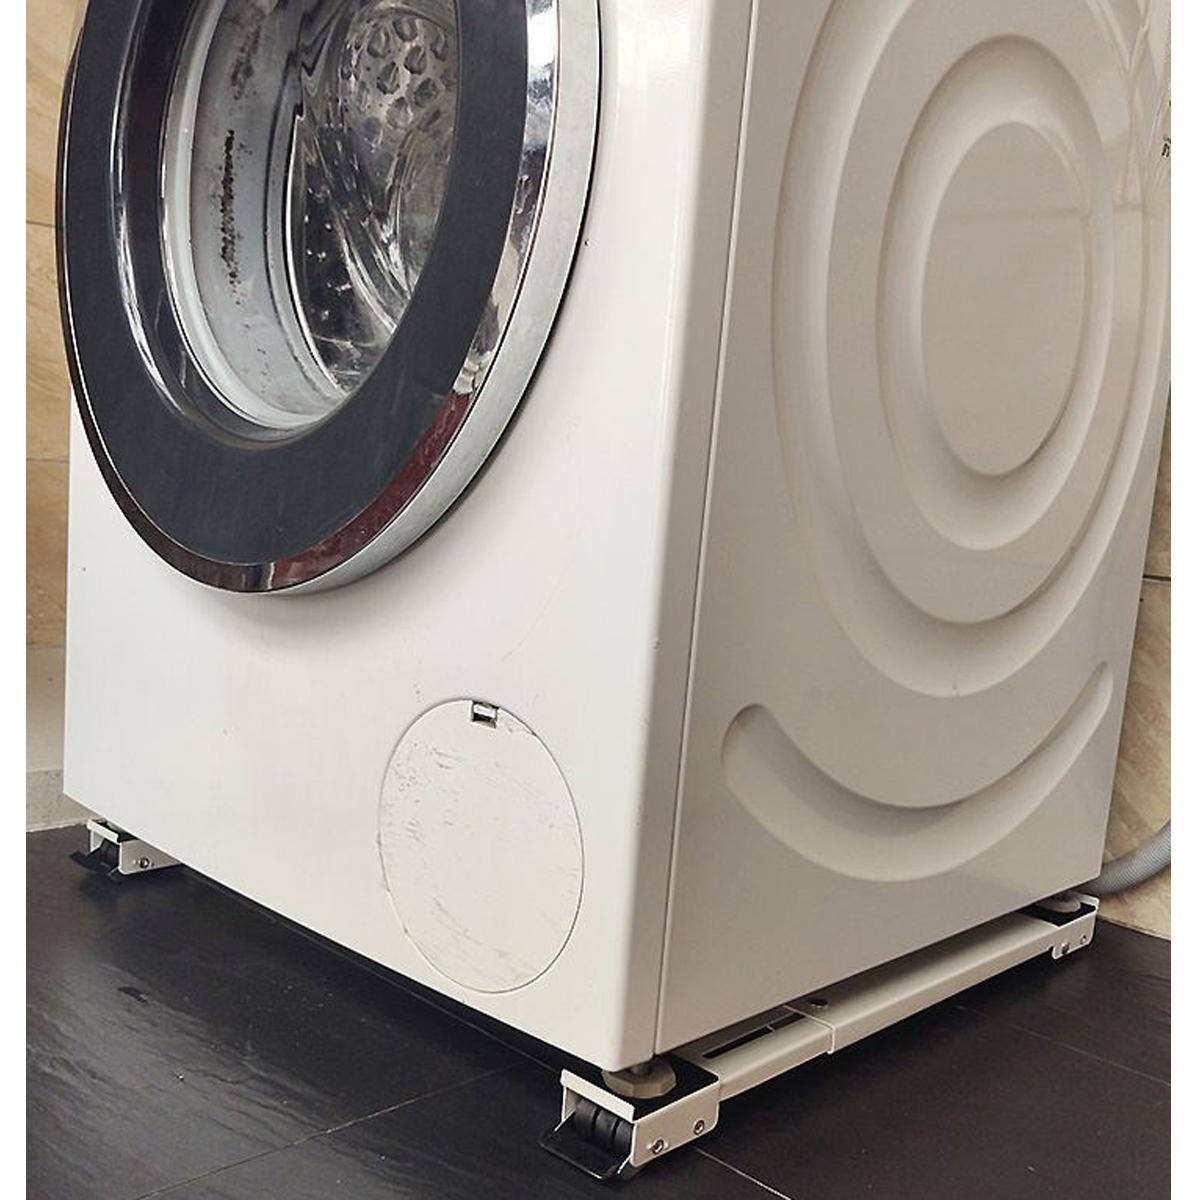 Adjustable Trolley Roller Stand Universal Washing Machine Heavy Appliance Wheel 3